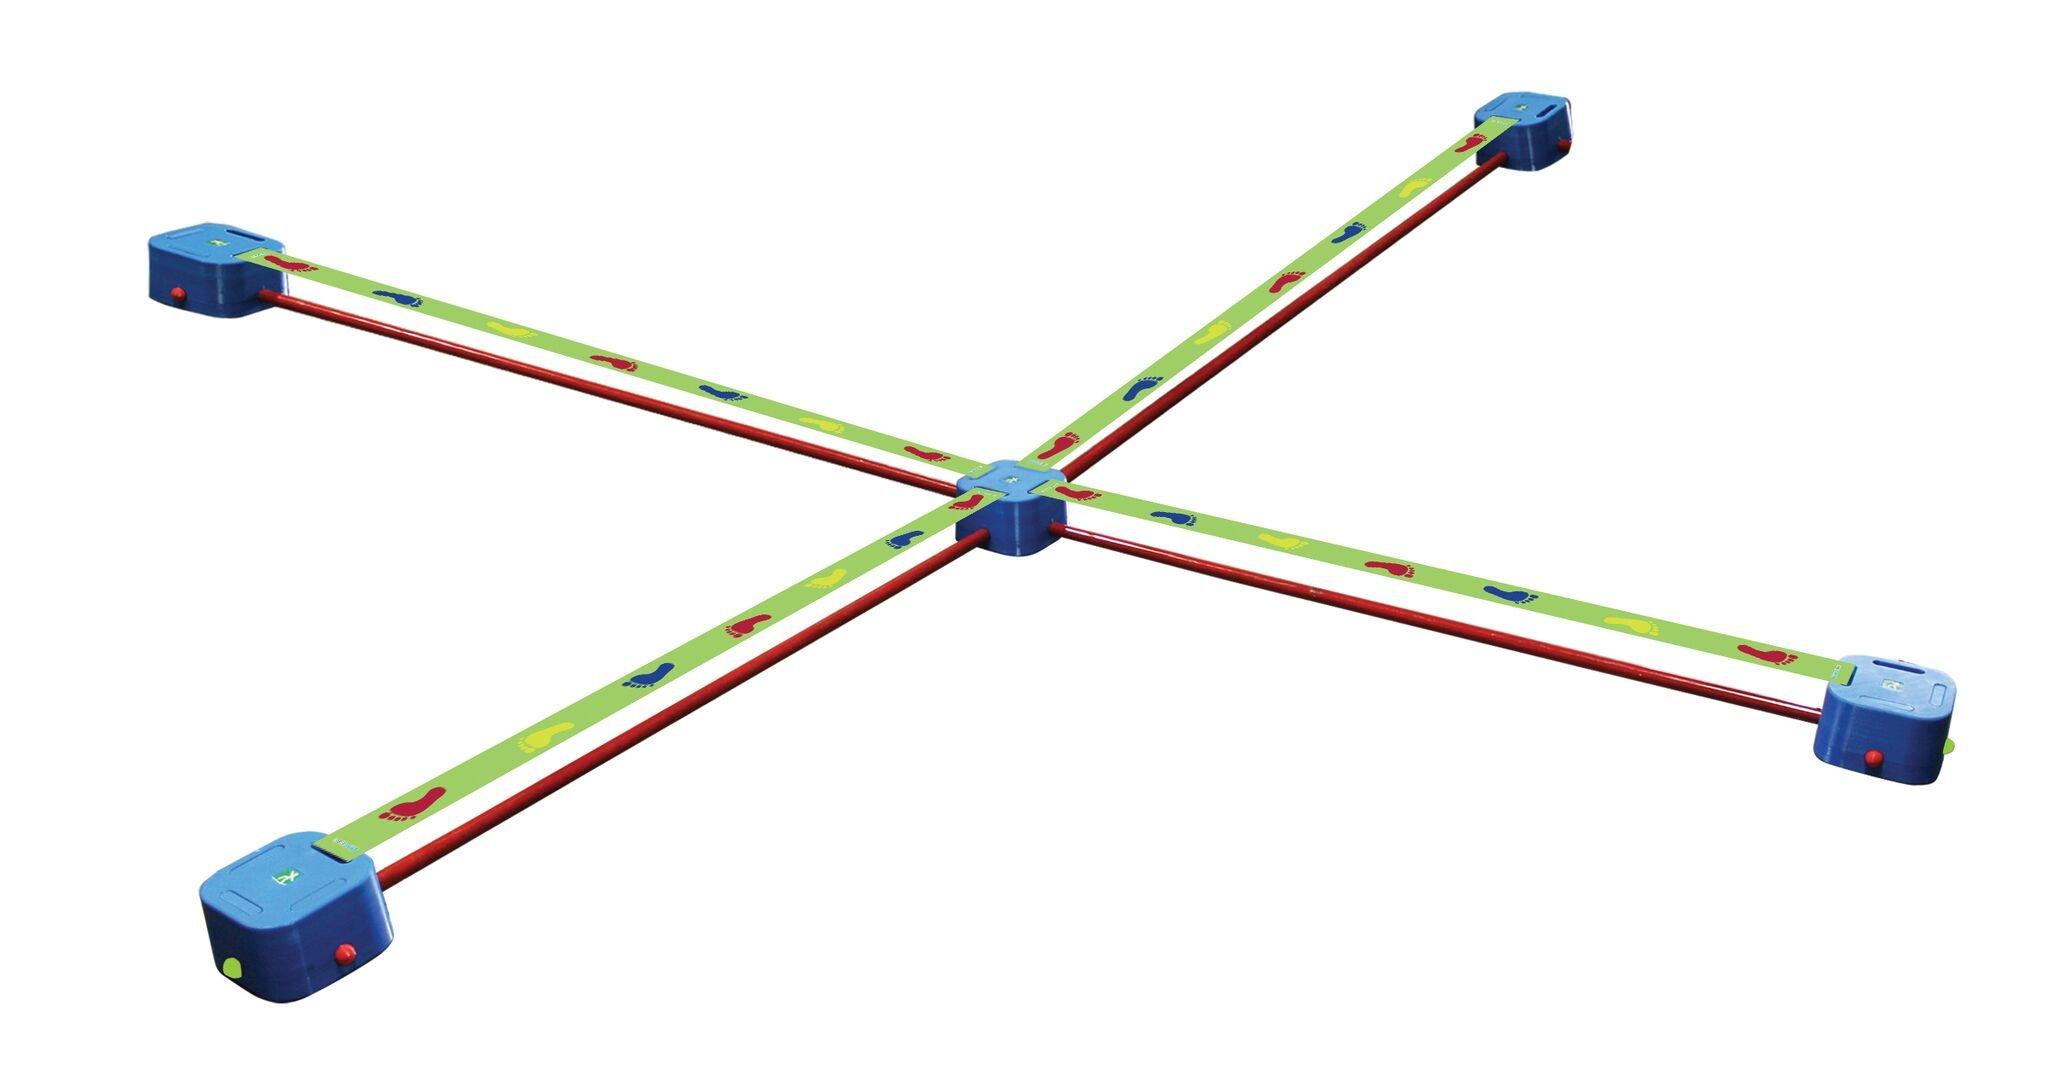 Playzone-fit Balance Blox Slackline Quad Toy by Playzone-fit